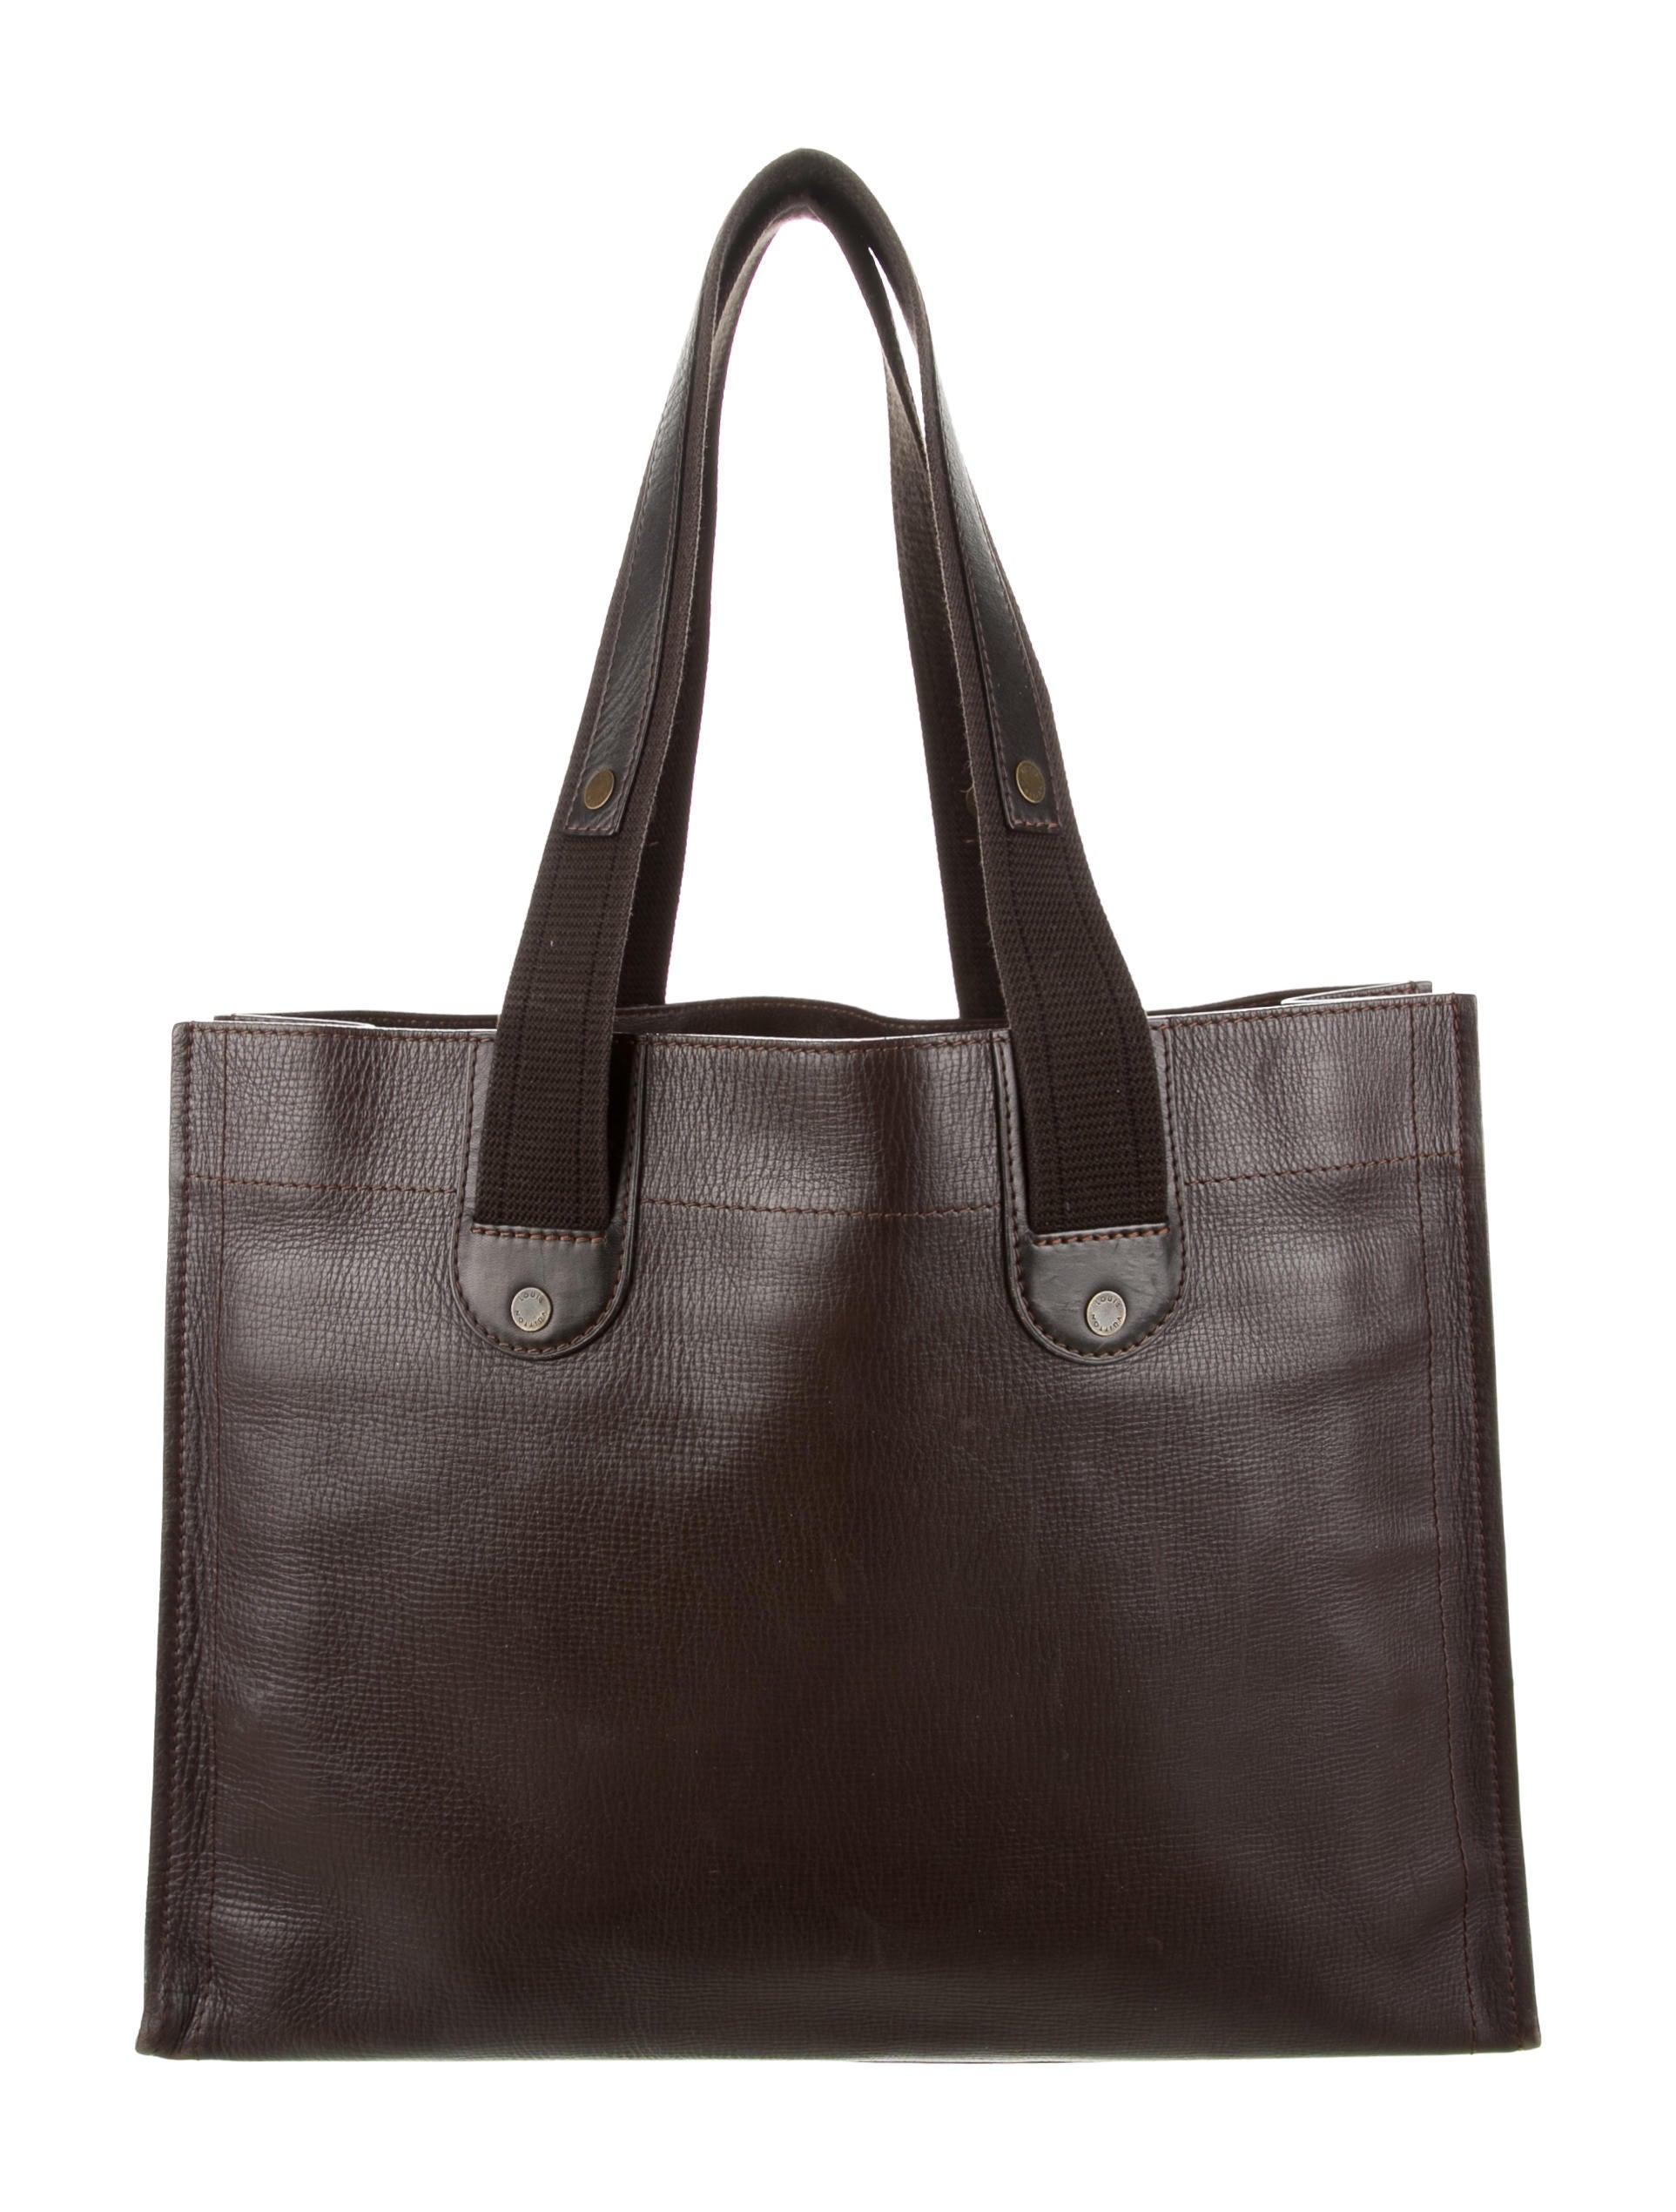 louis vuitton utah shopper tote handbags lou87320. Black Bedroom Furniture Sets. Home Design Ideas